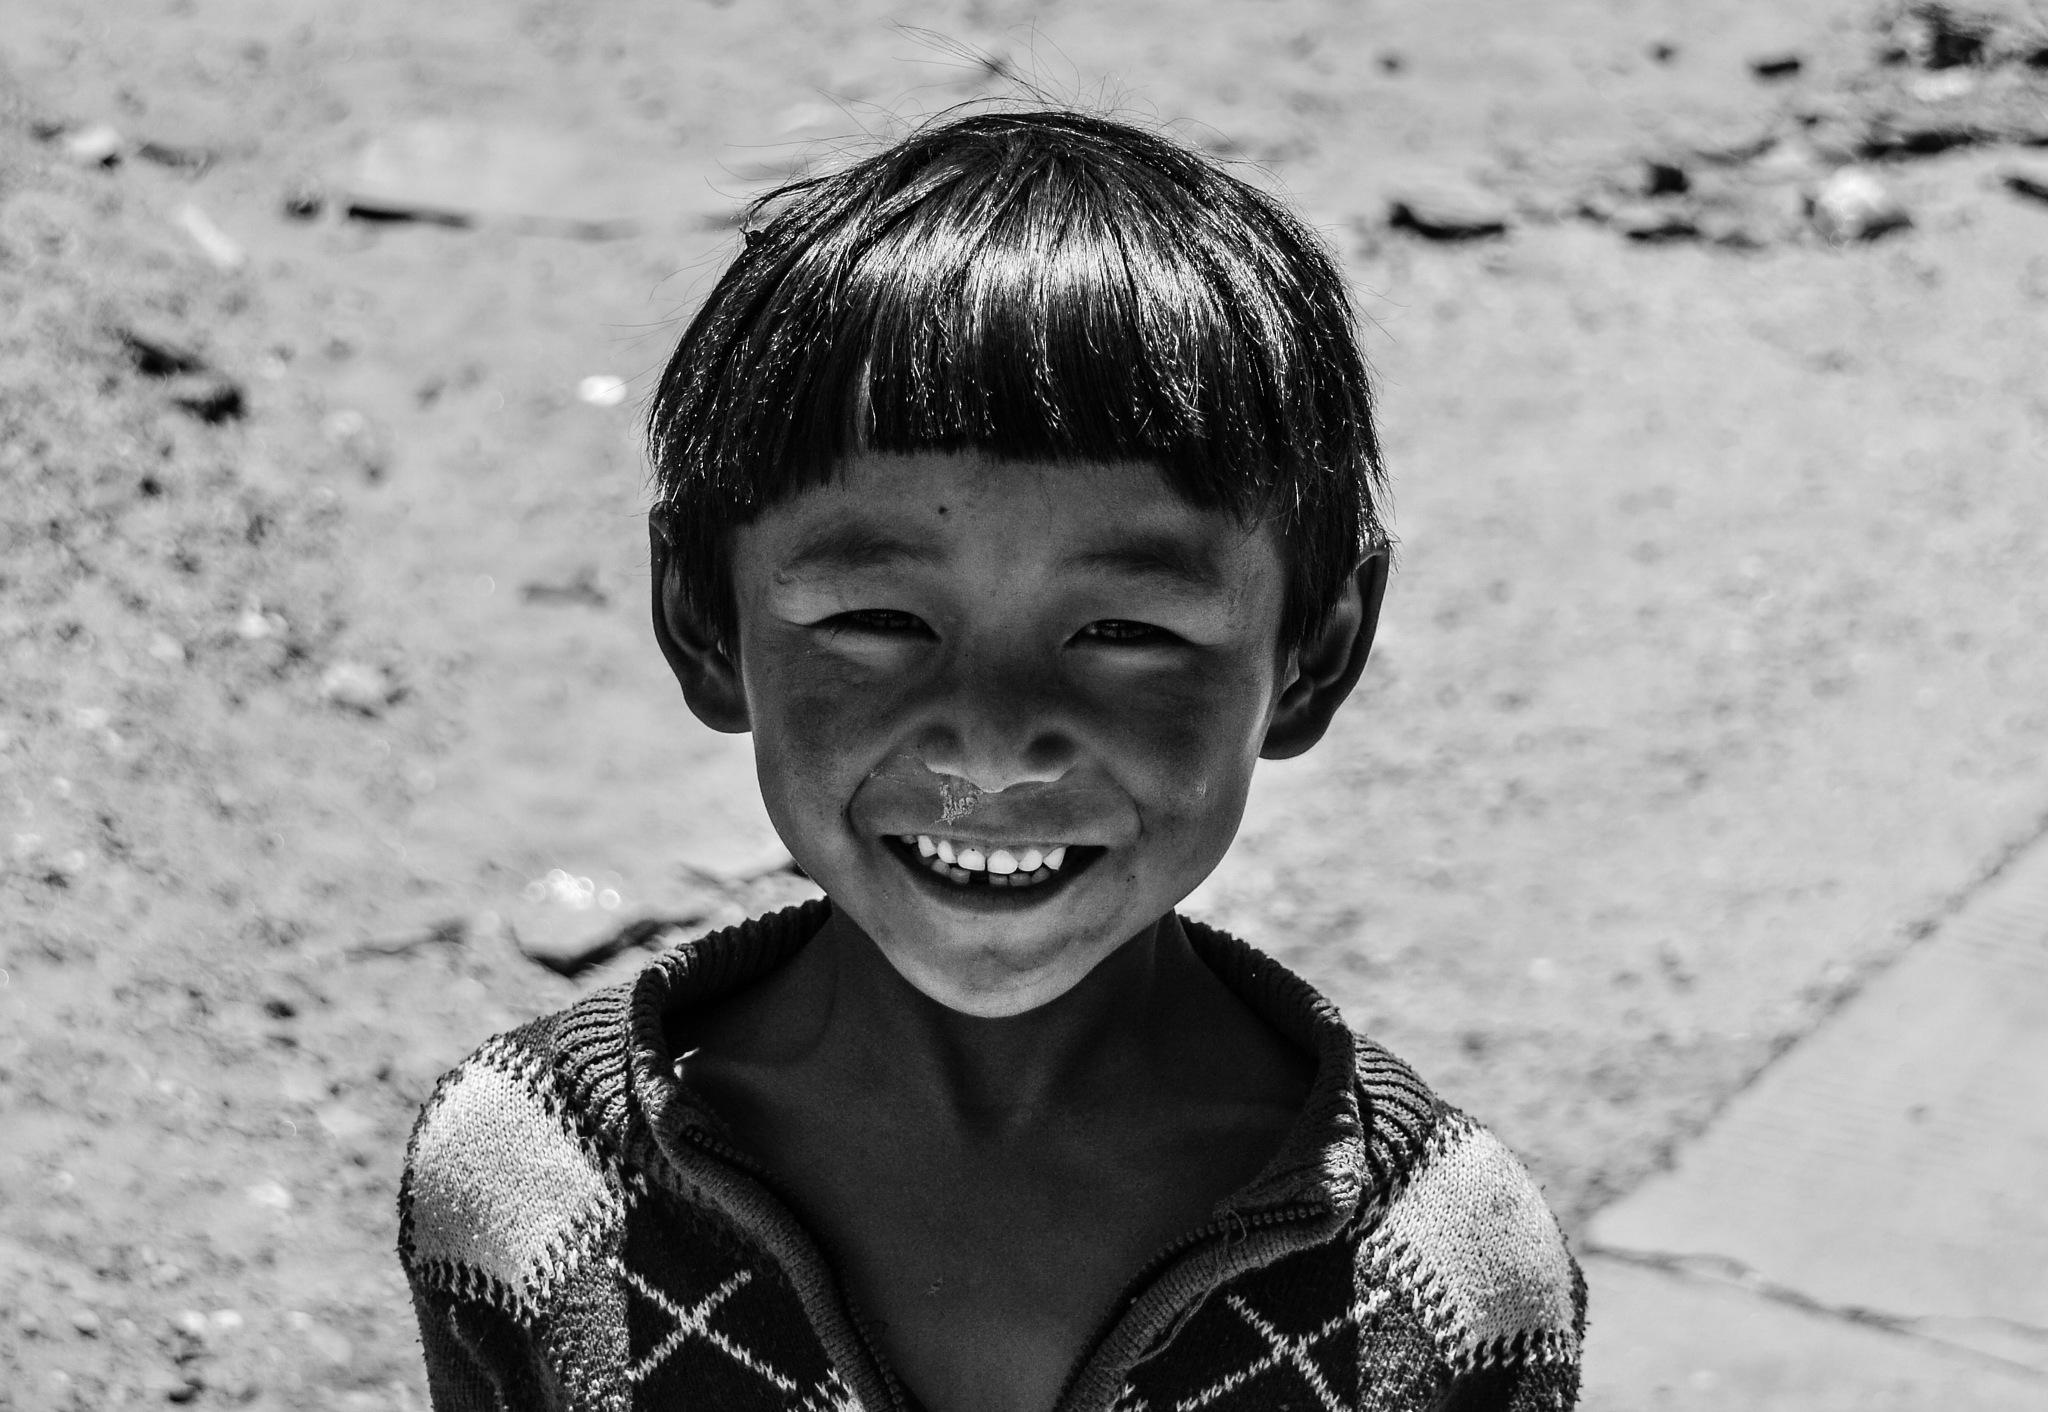 Smile! by Daniele Salutari